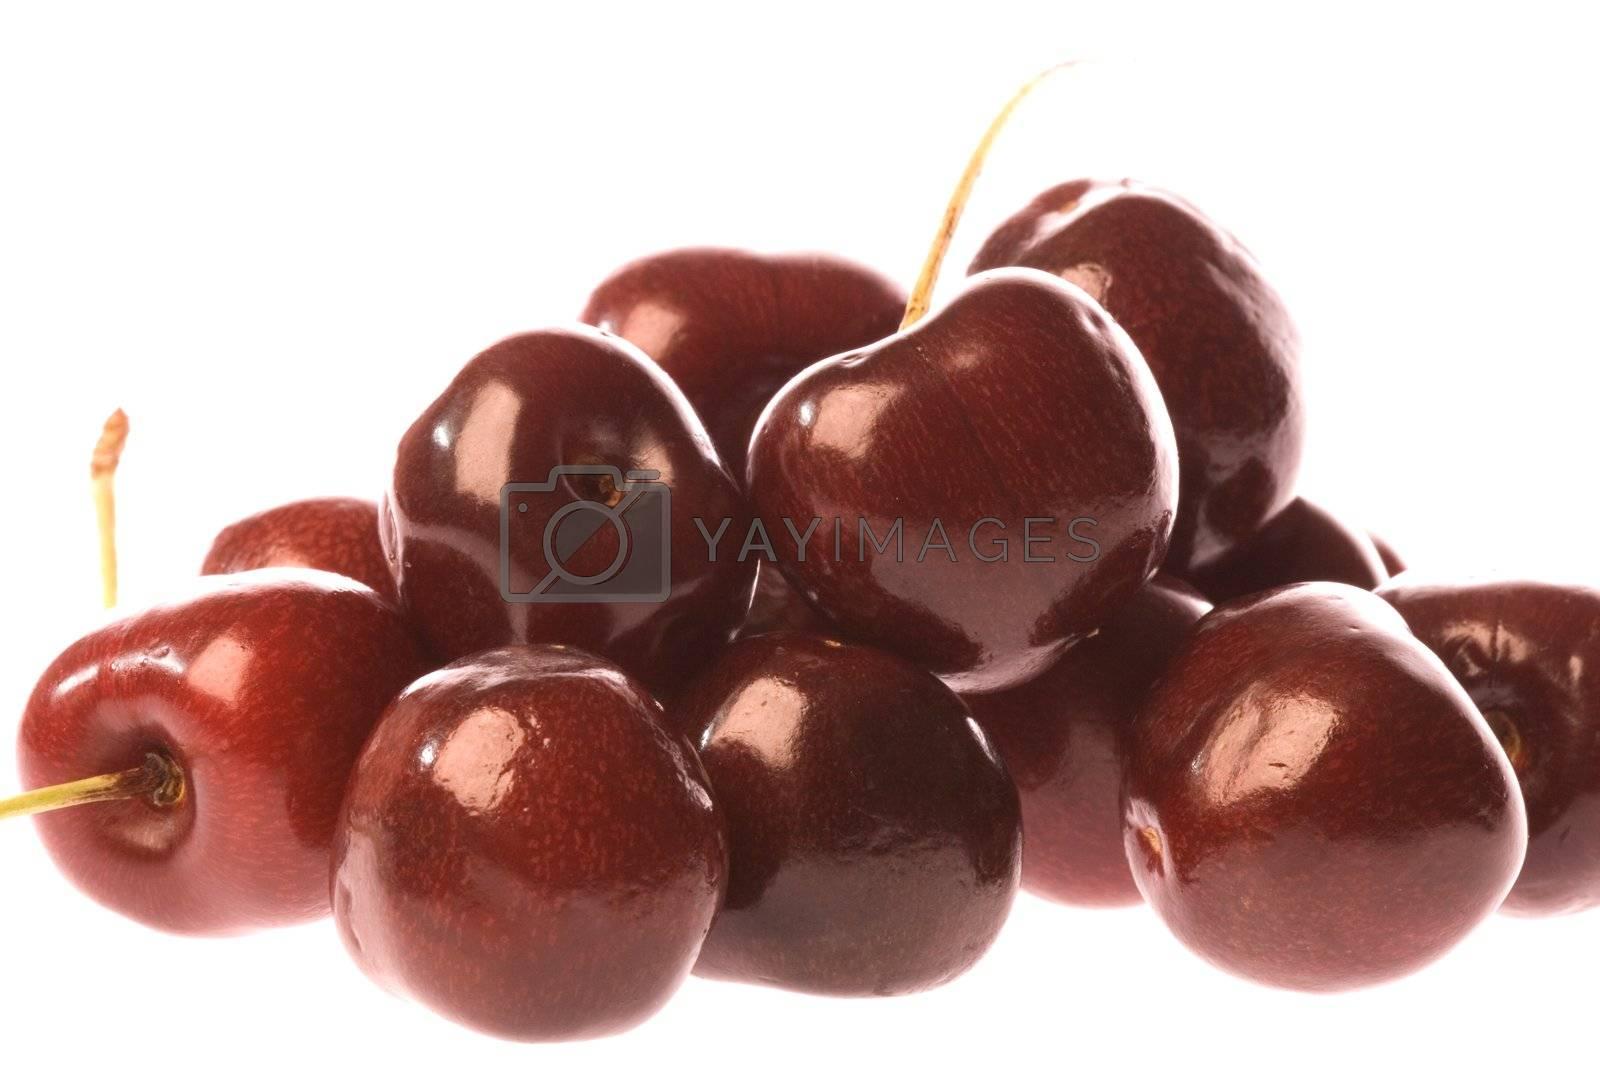 Isolated macro image of fresh cherries.